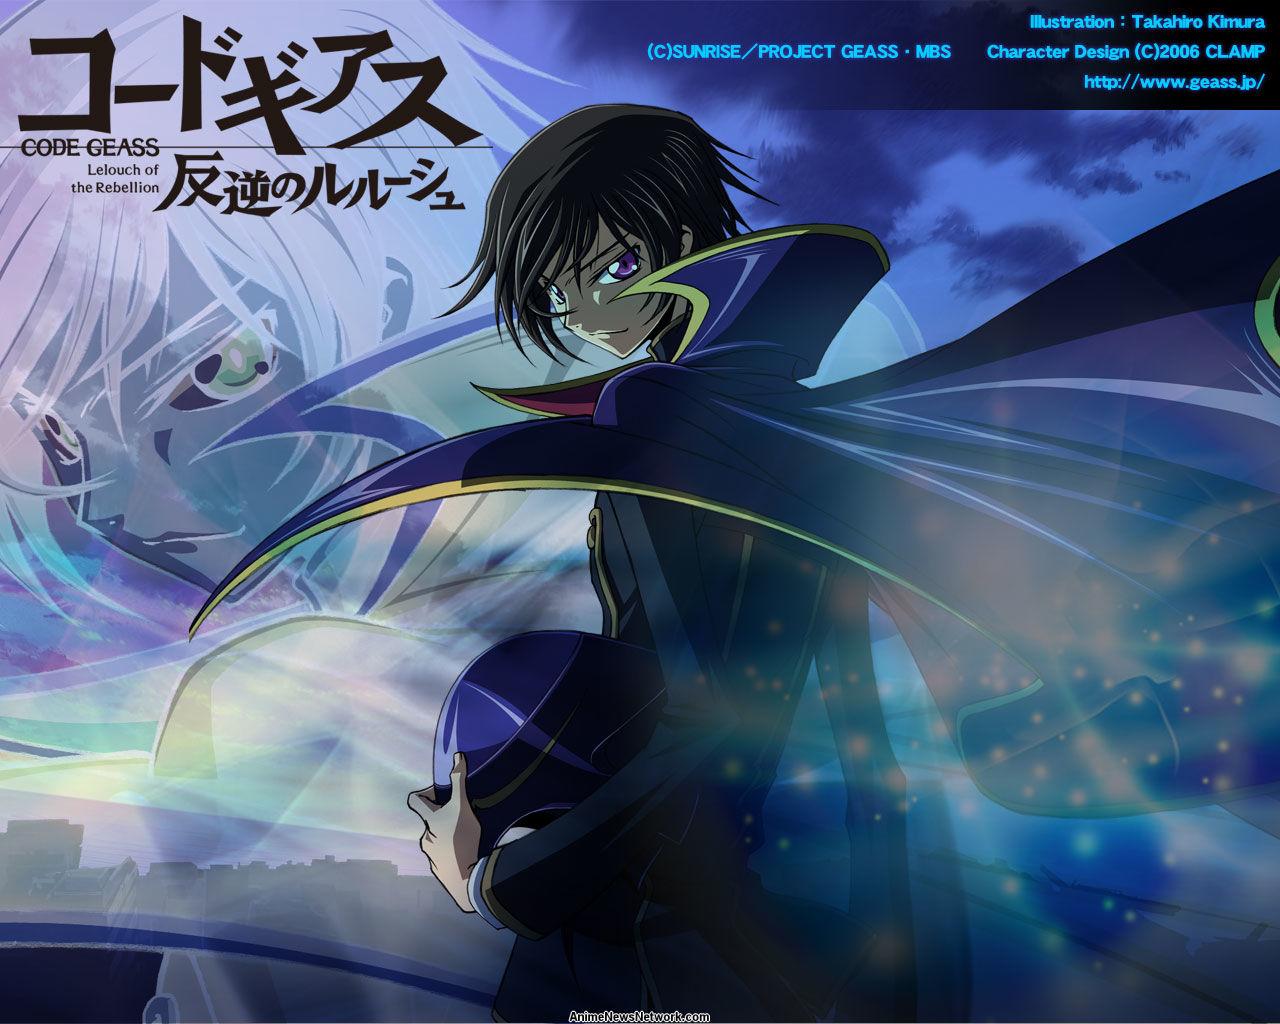 Code Geass Episodes 24 25 S Japanese Airing Scheduled News